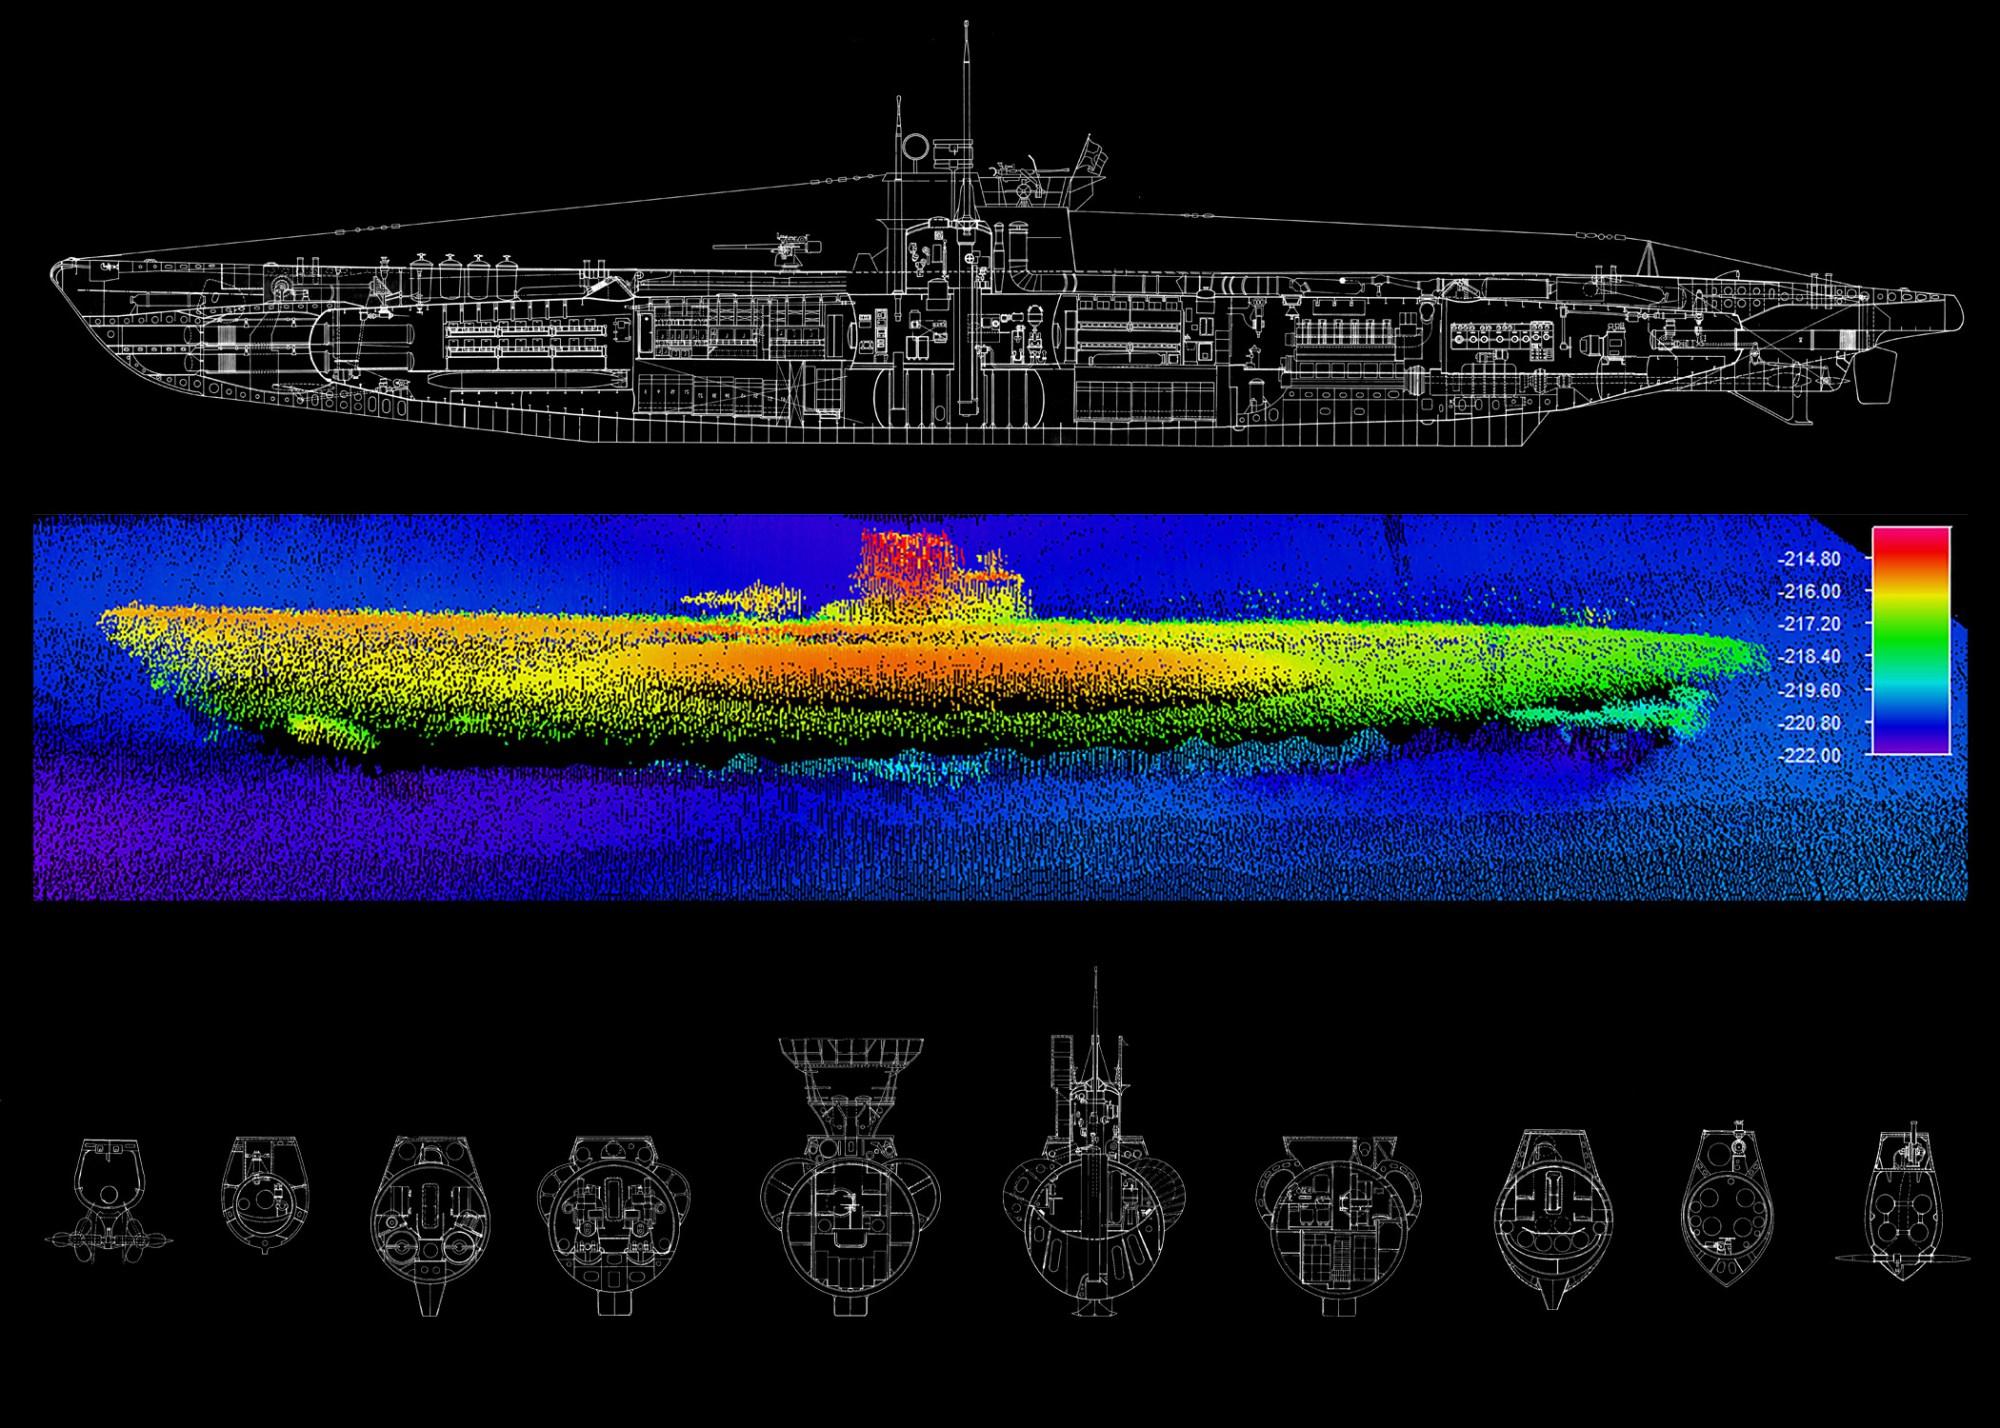 hight resolution of diagram top and sonar image below of u 576